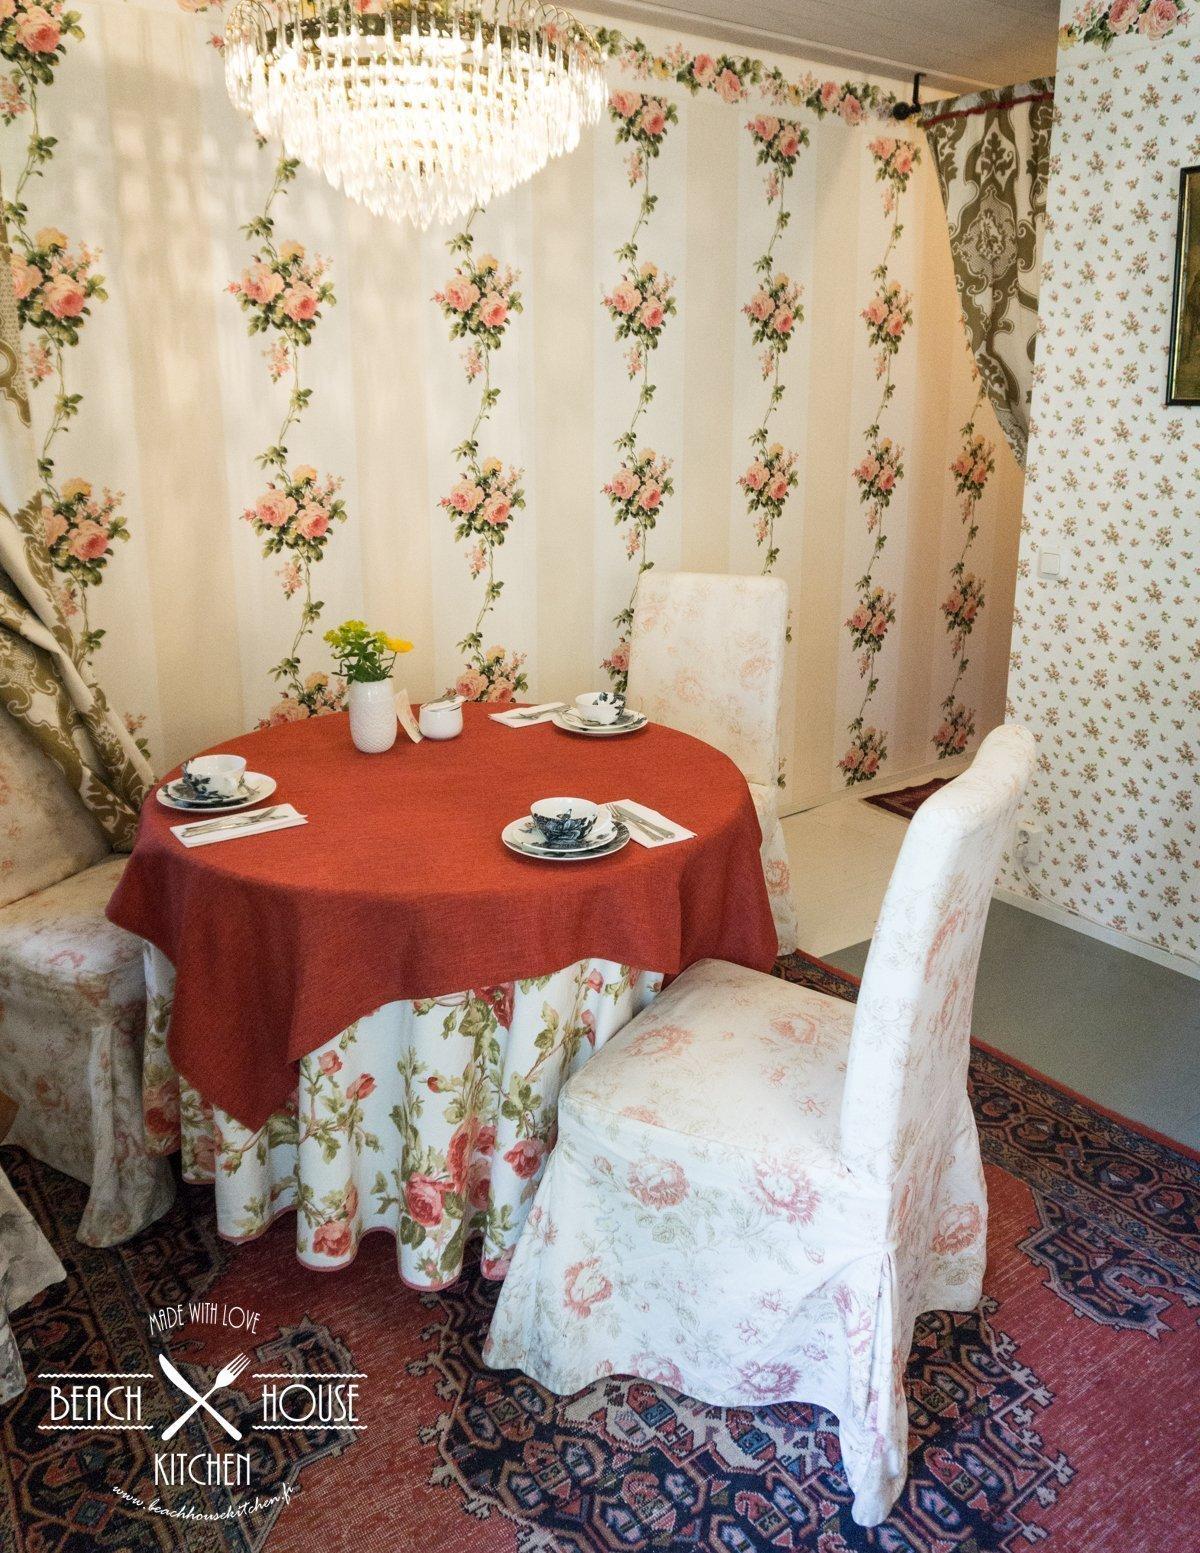 Teahouse of Wehmais